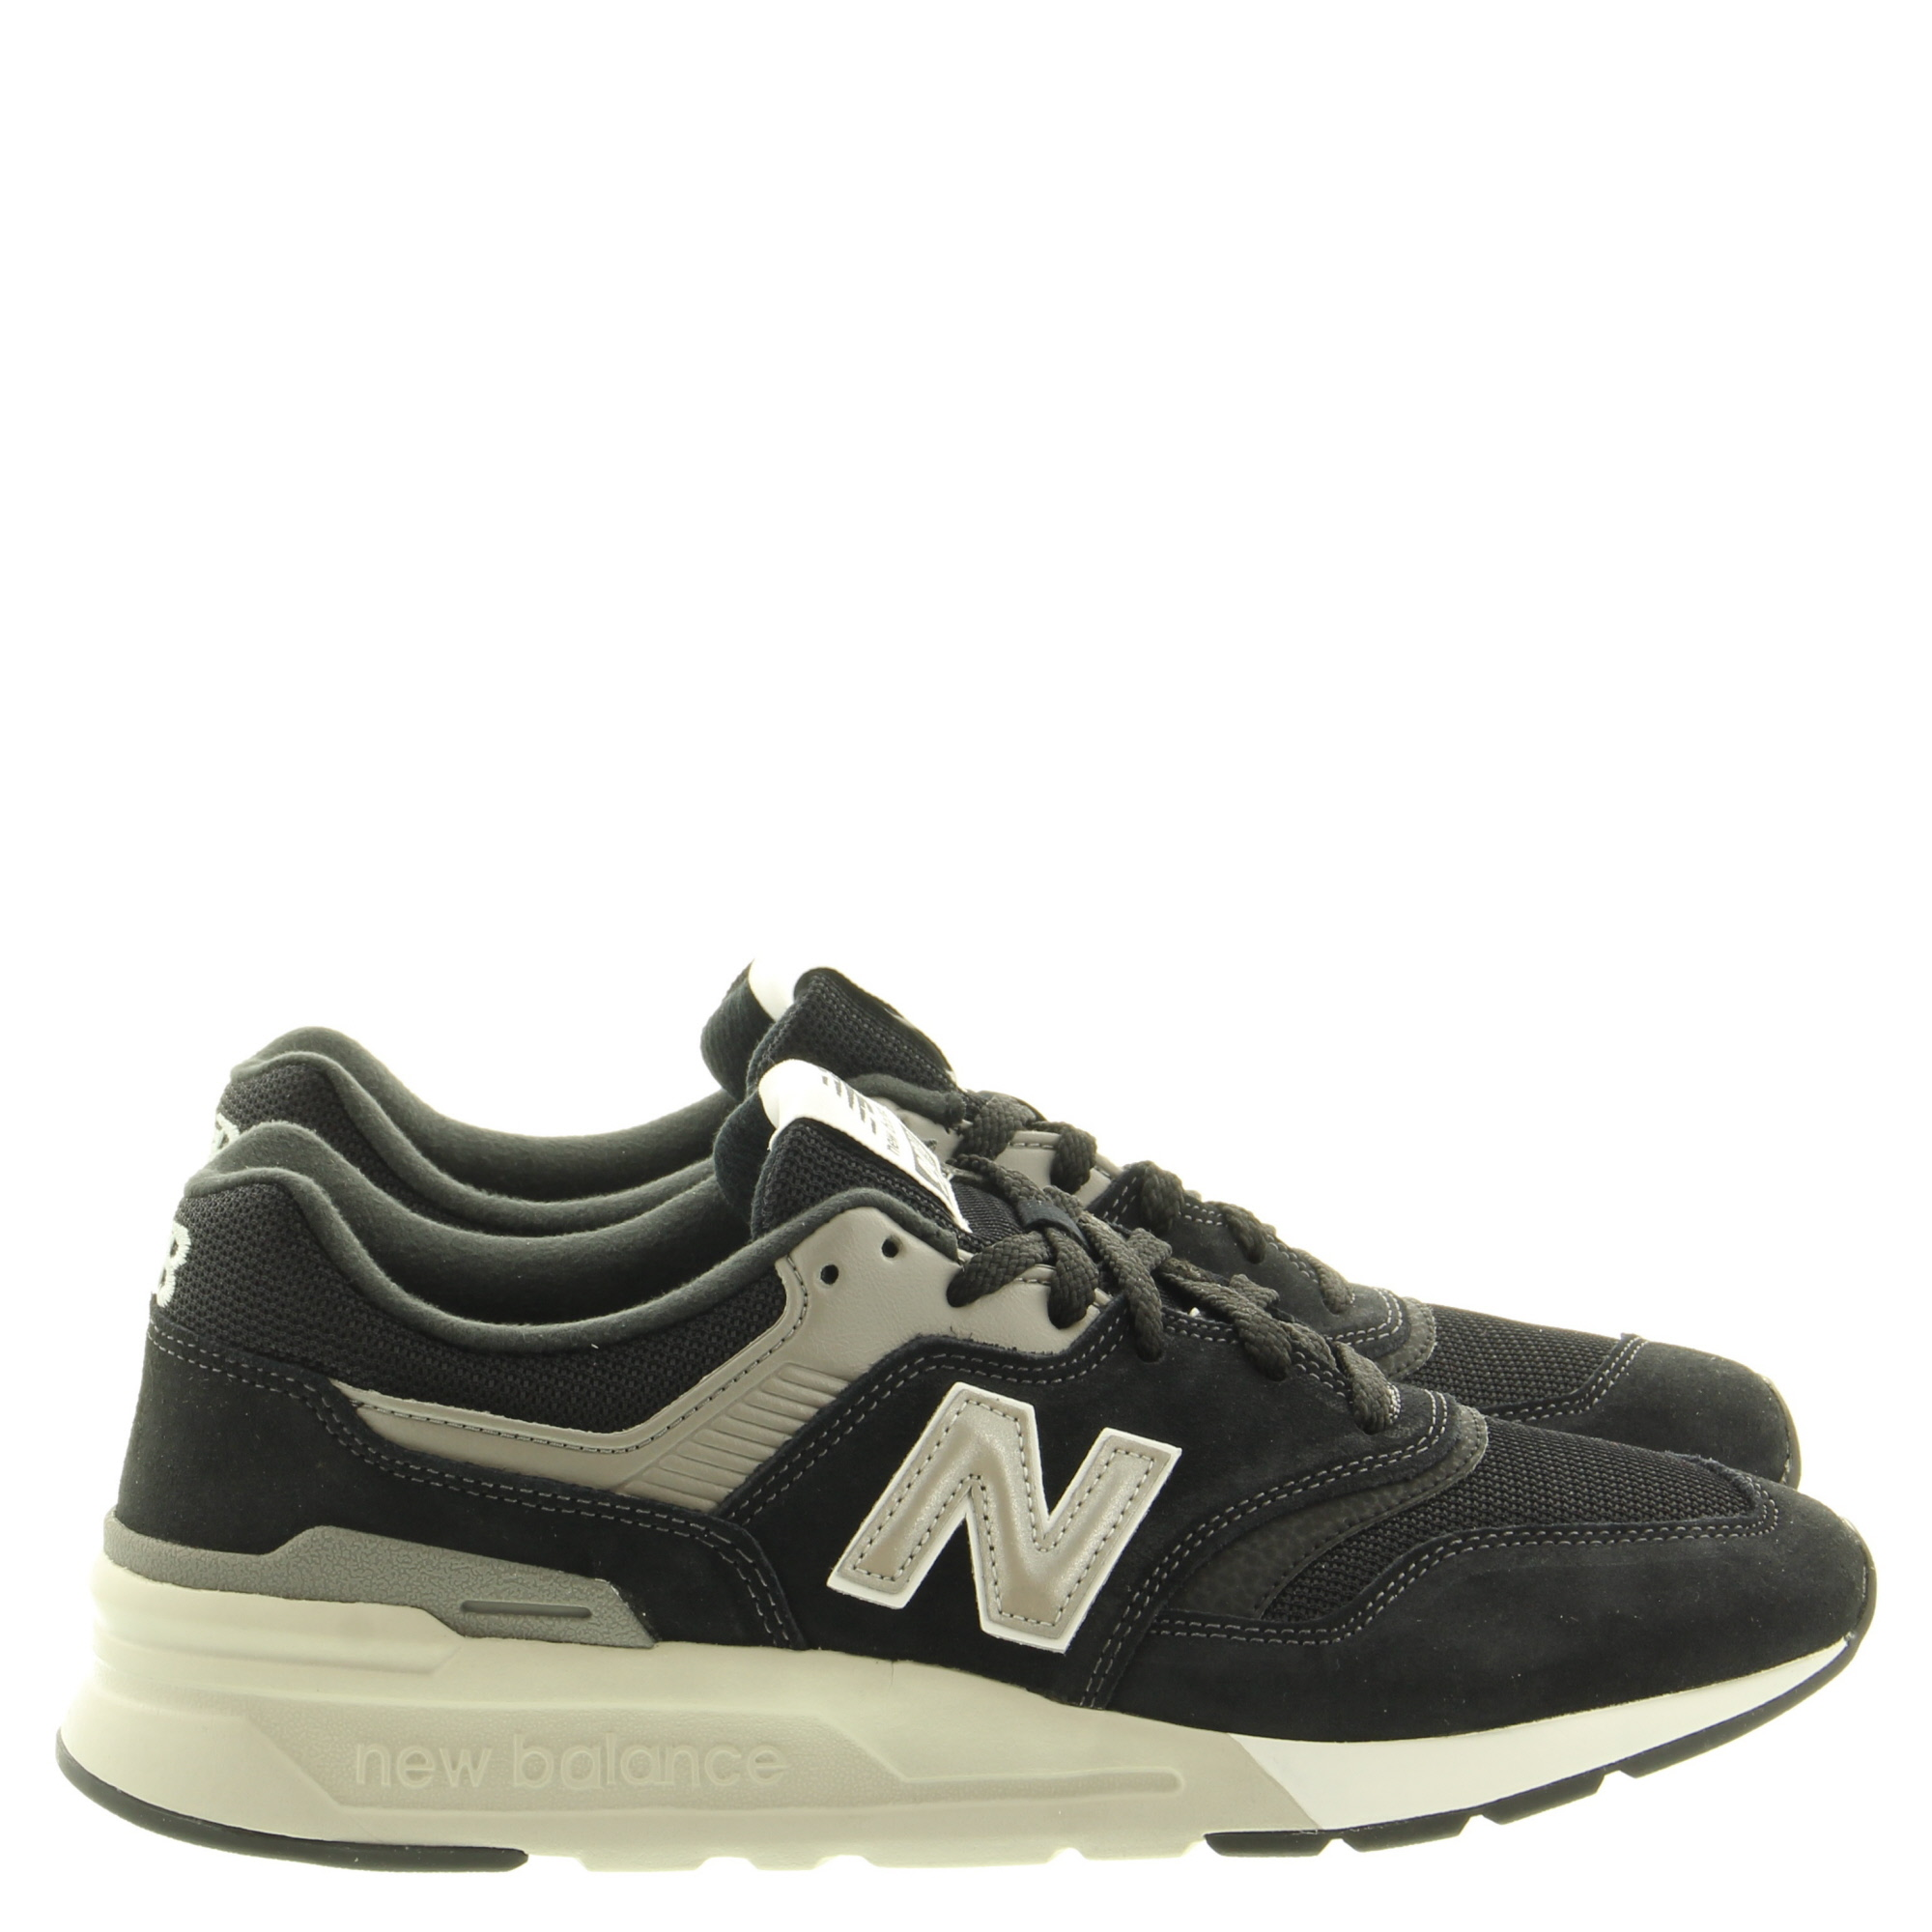 New Balance CM997HCC 001 Black